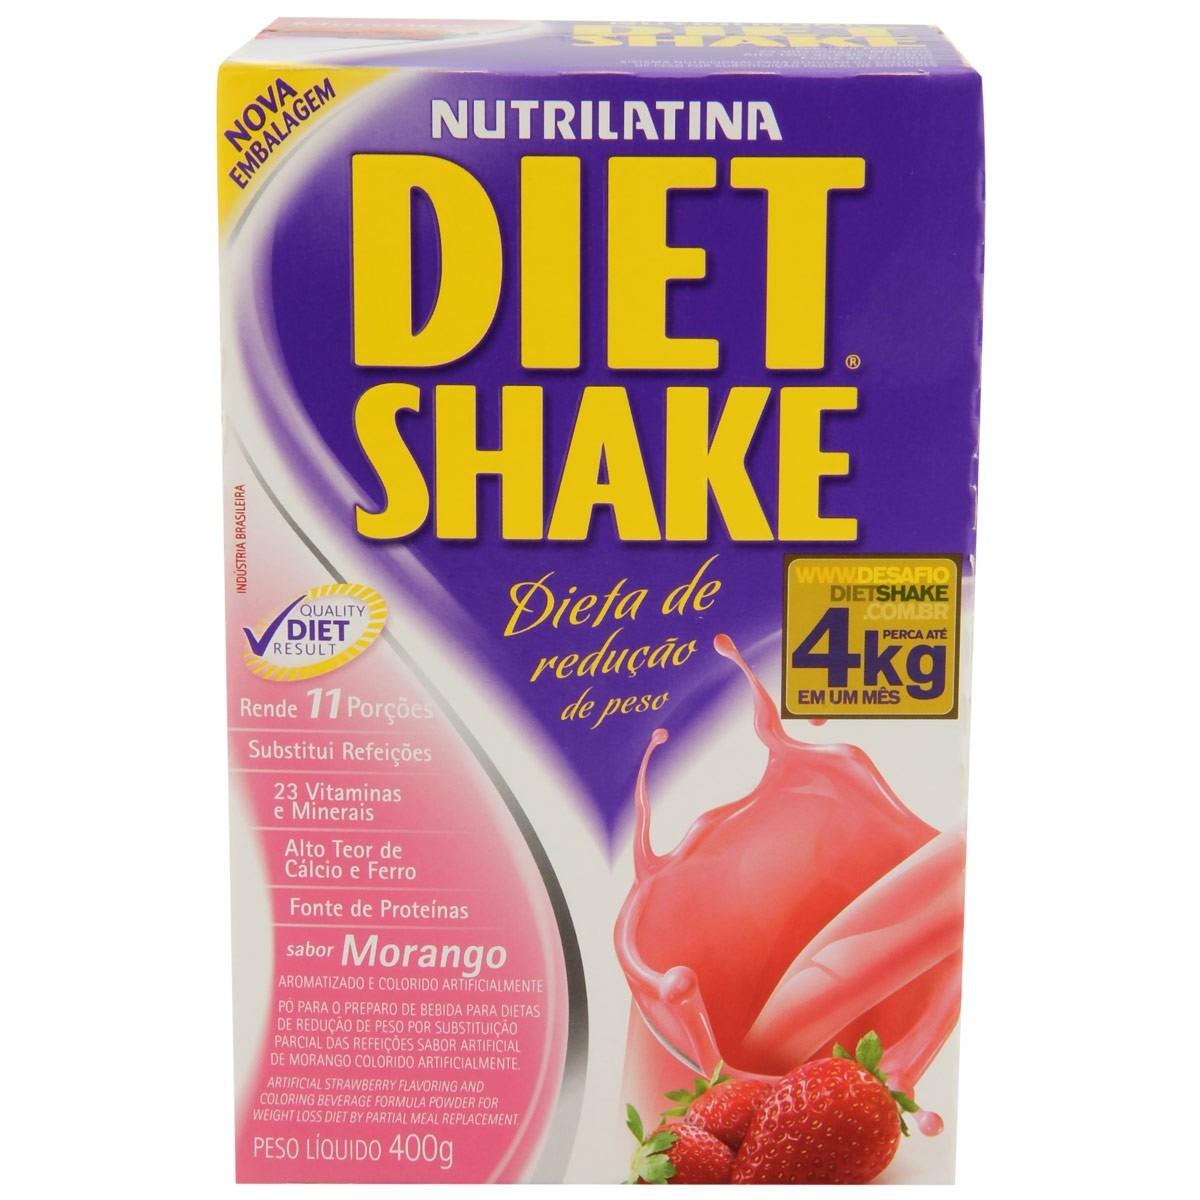 diet shakes diets